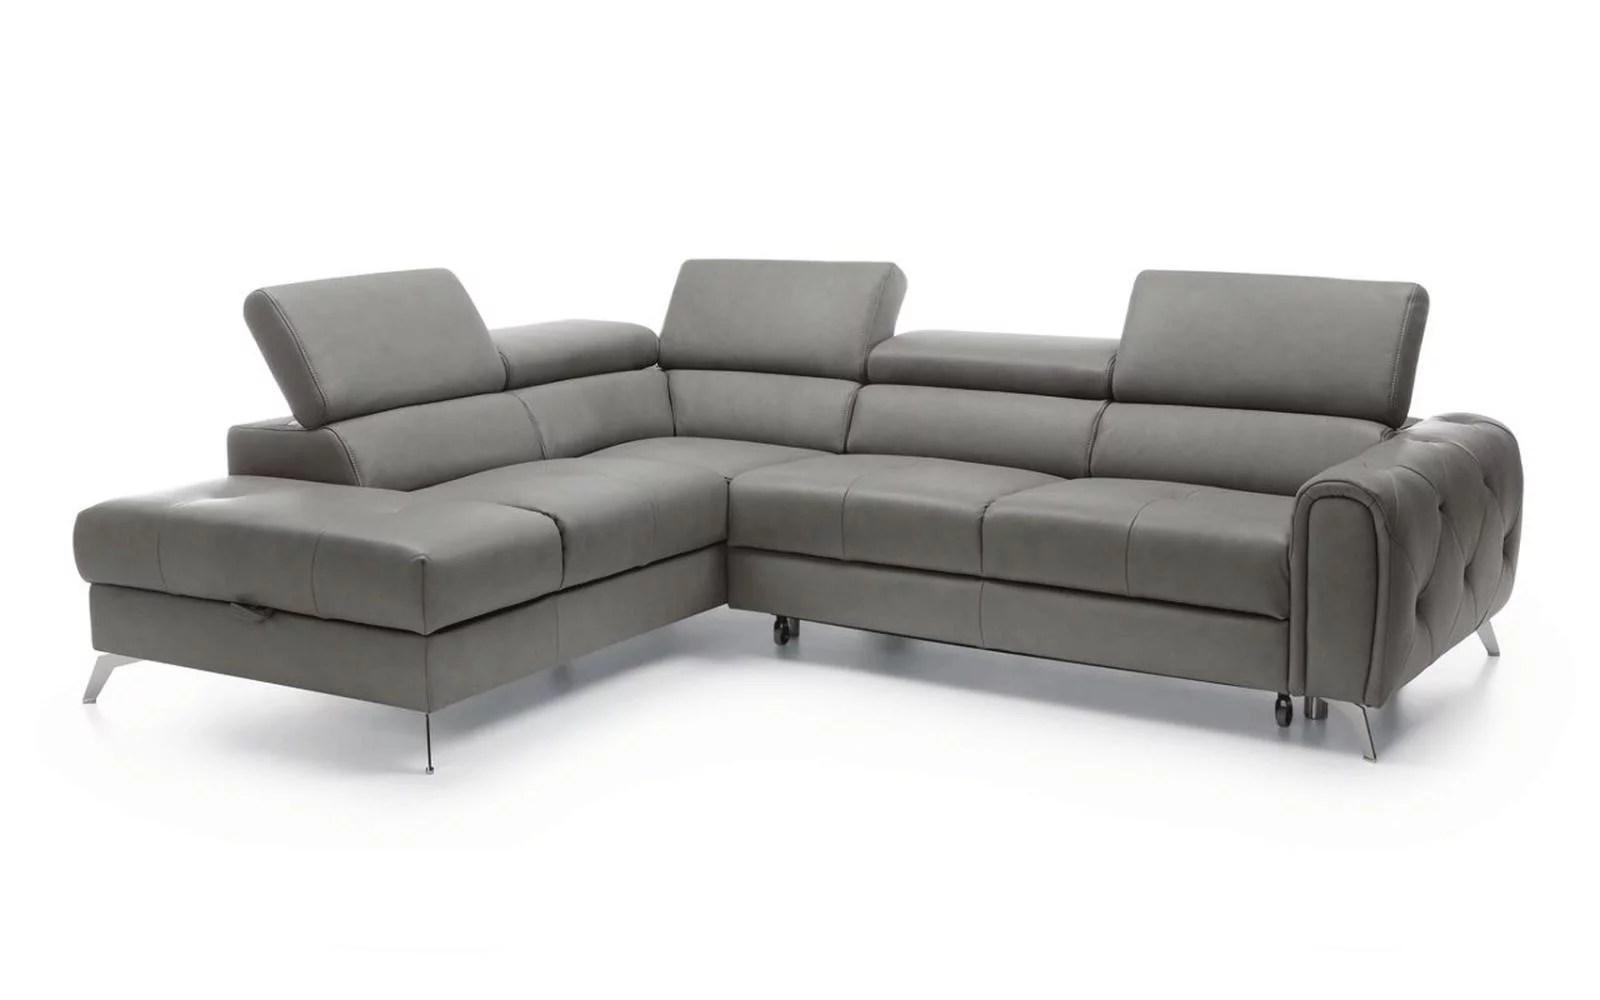 grey italian genuine leather sectional sofa bed storage modern left soflex camelia walmart com